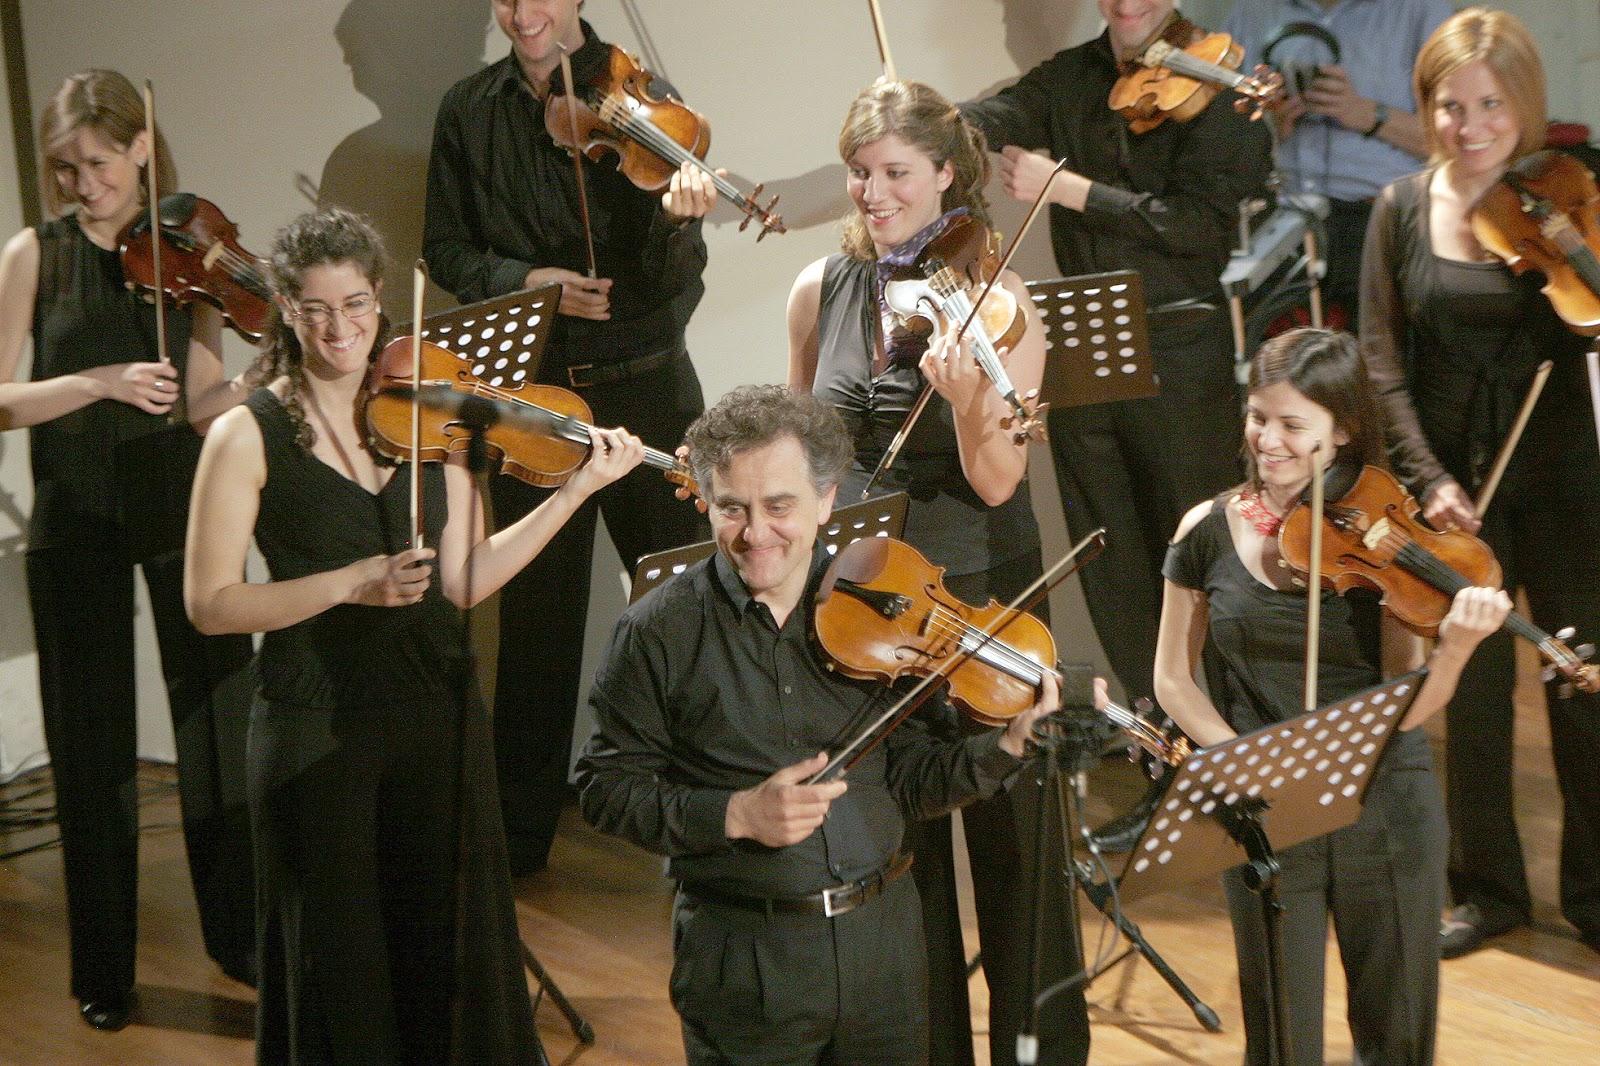 Programma 2015 Concerti Cappella Paolina al Quirinale